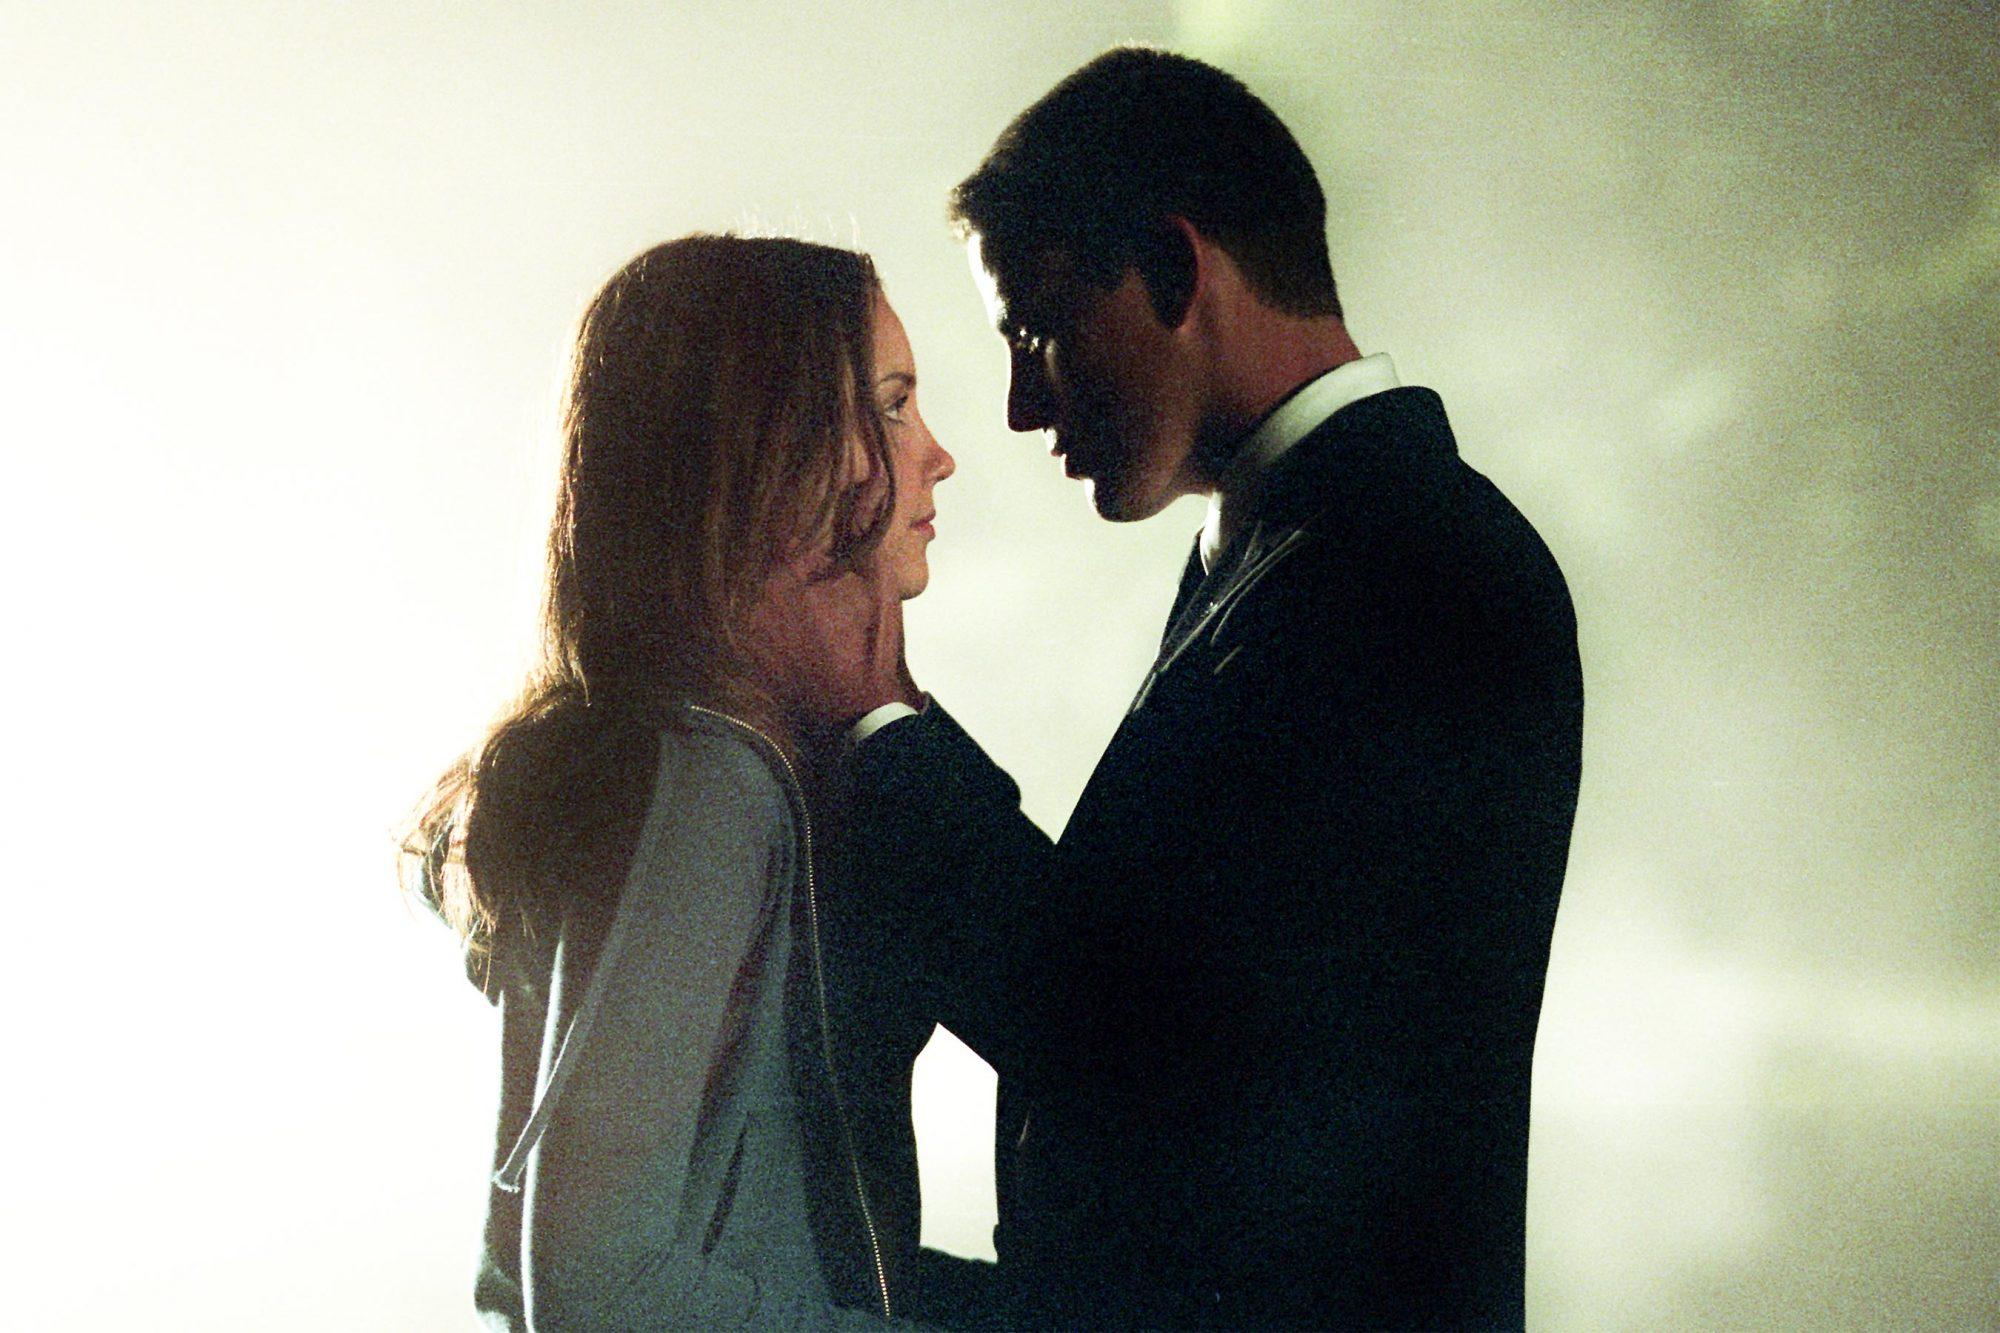 SHE'S THE MAN, Amanda Bynes, Channing Tatum, 2006, ©DreamWorks/courtesy Everett Collection